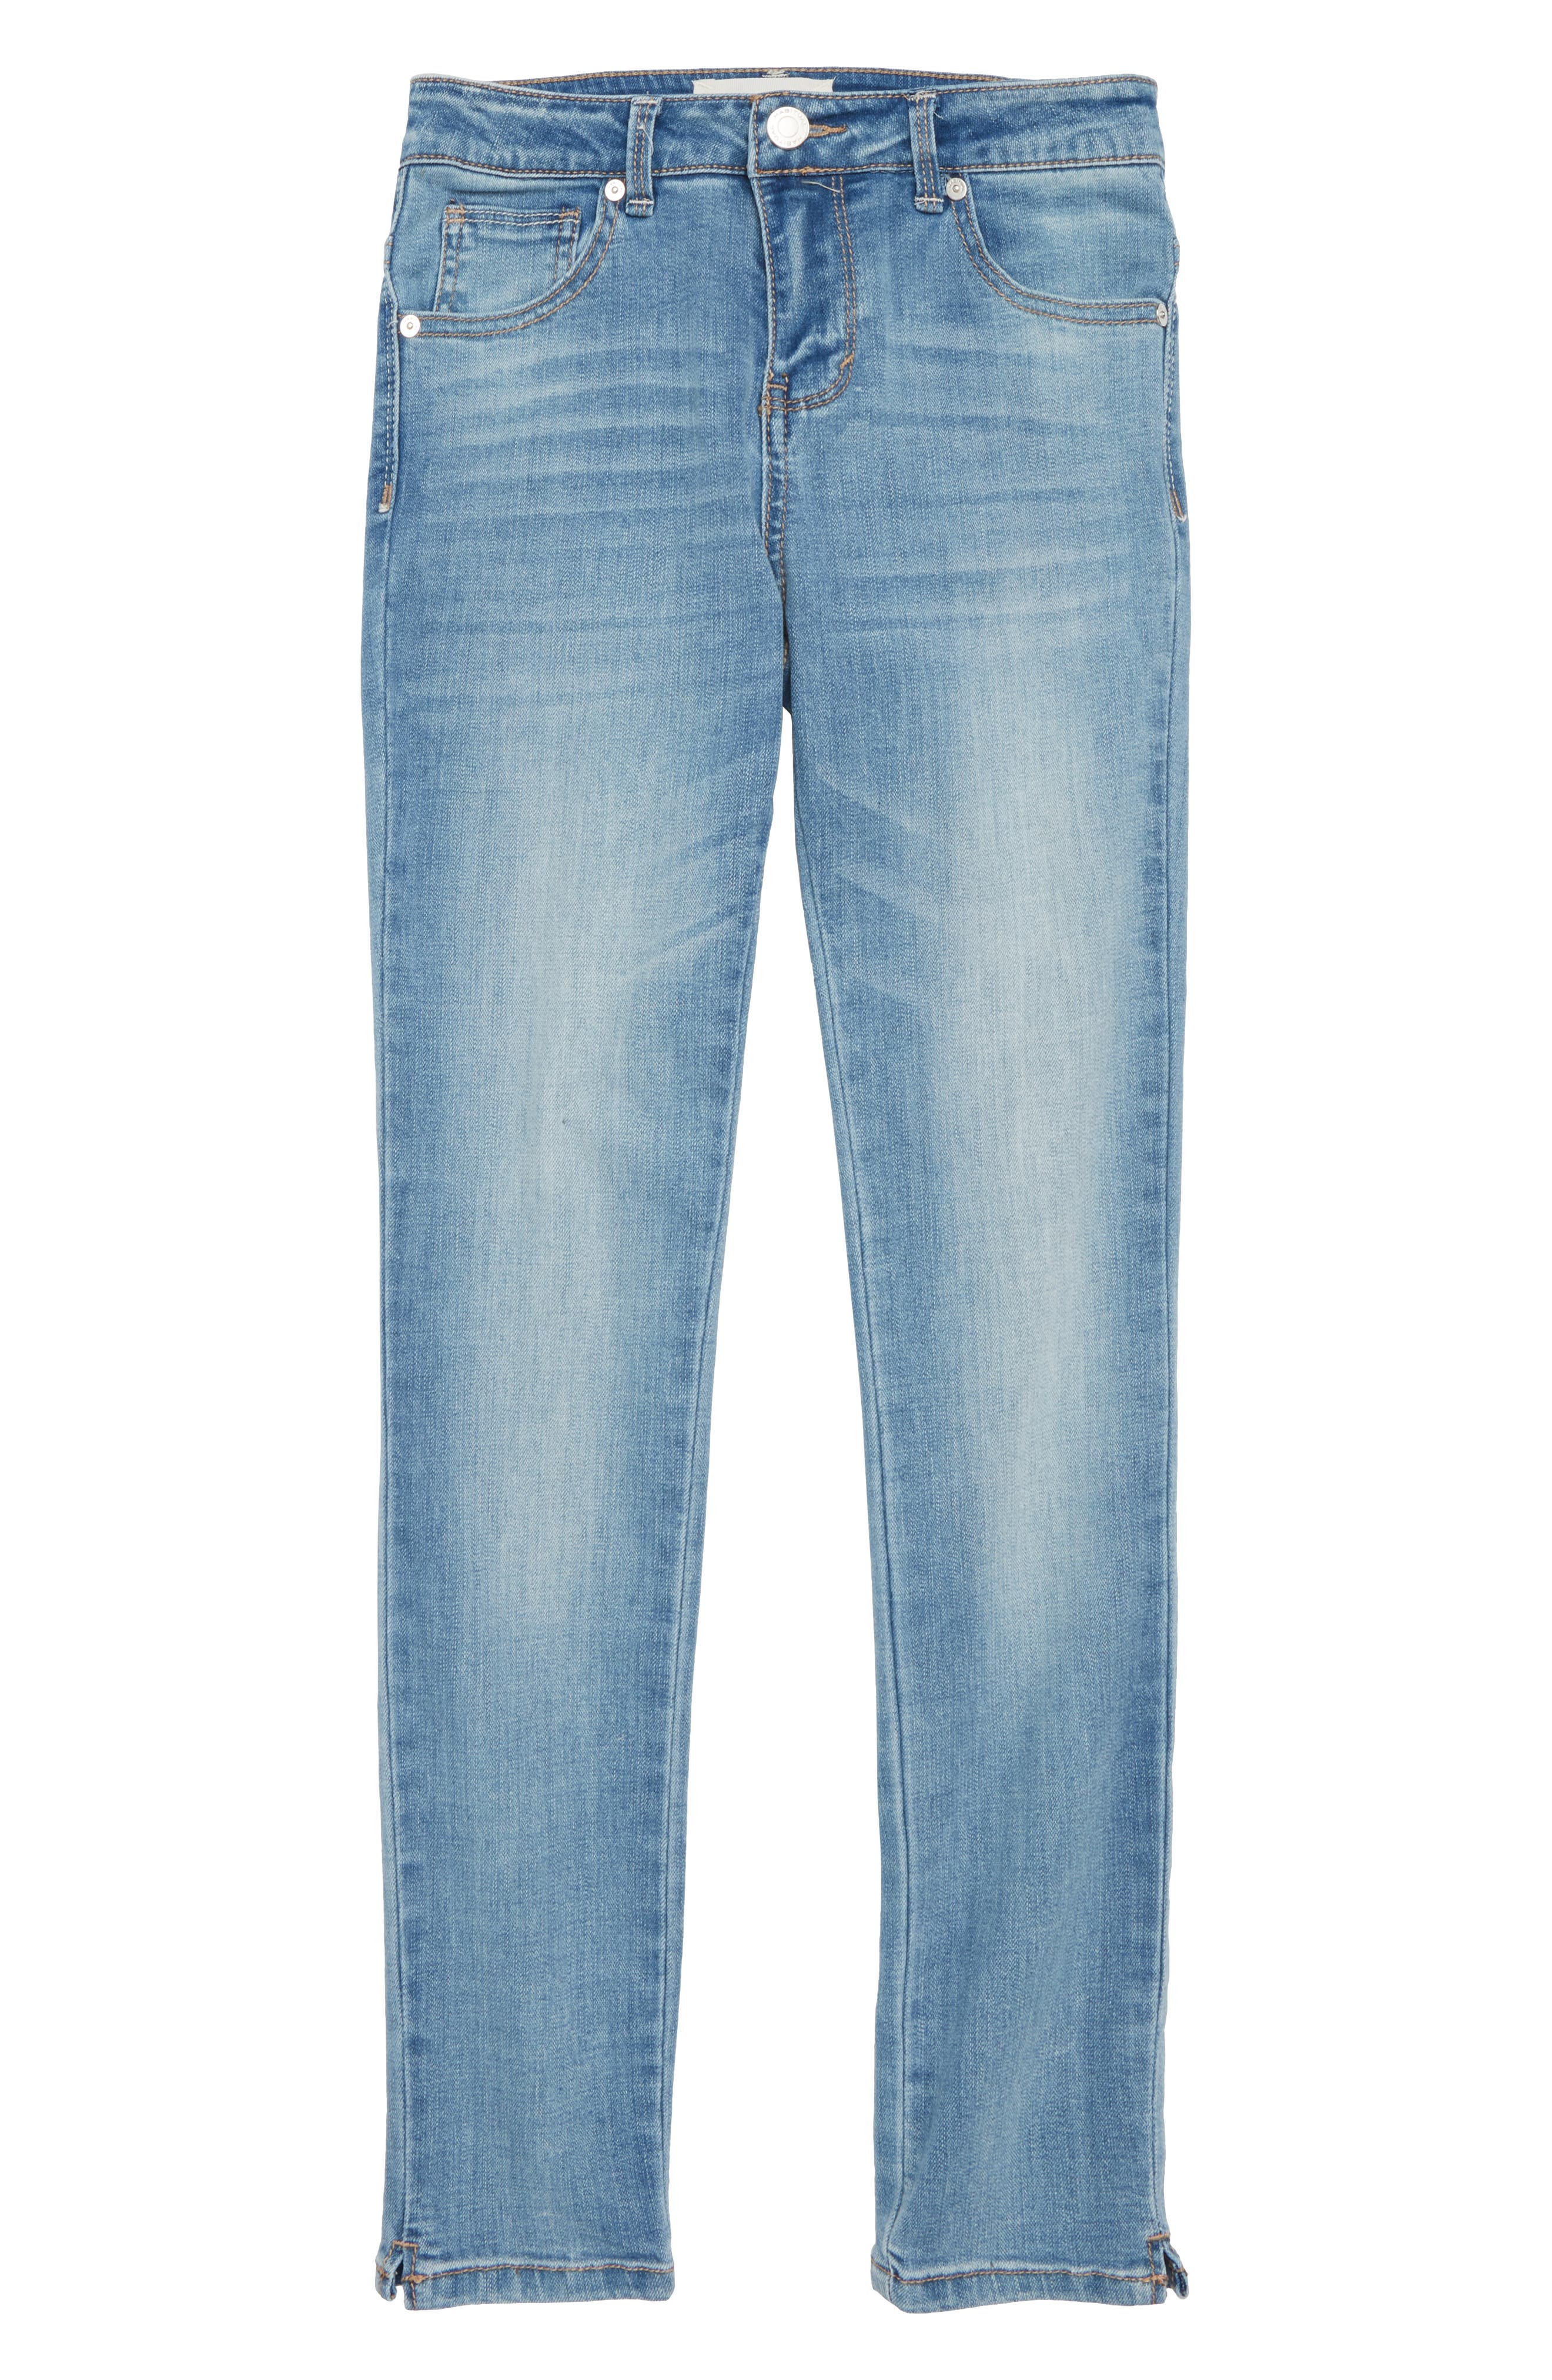 Skinny Jeans,                         Main,                         color, Light Stone